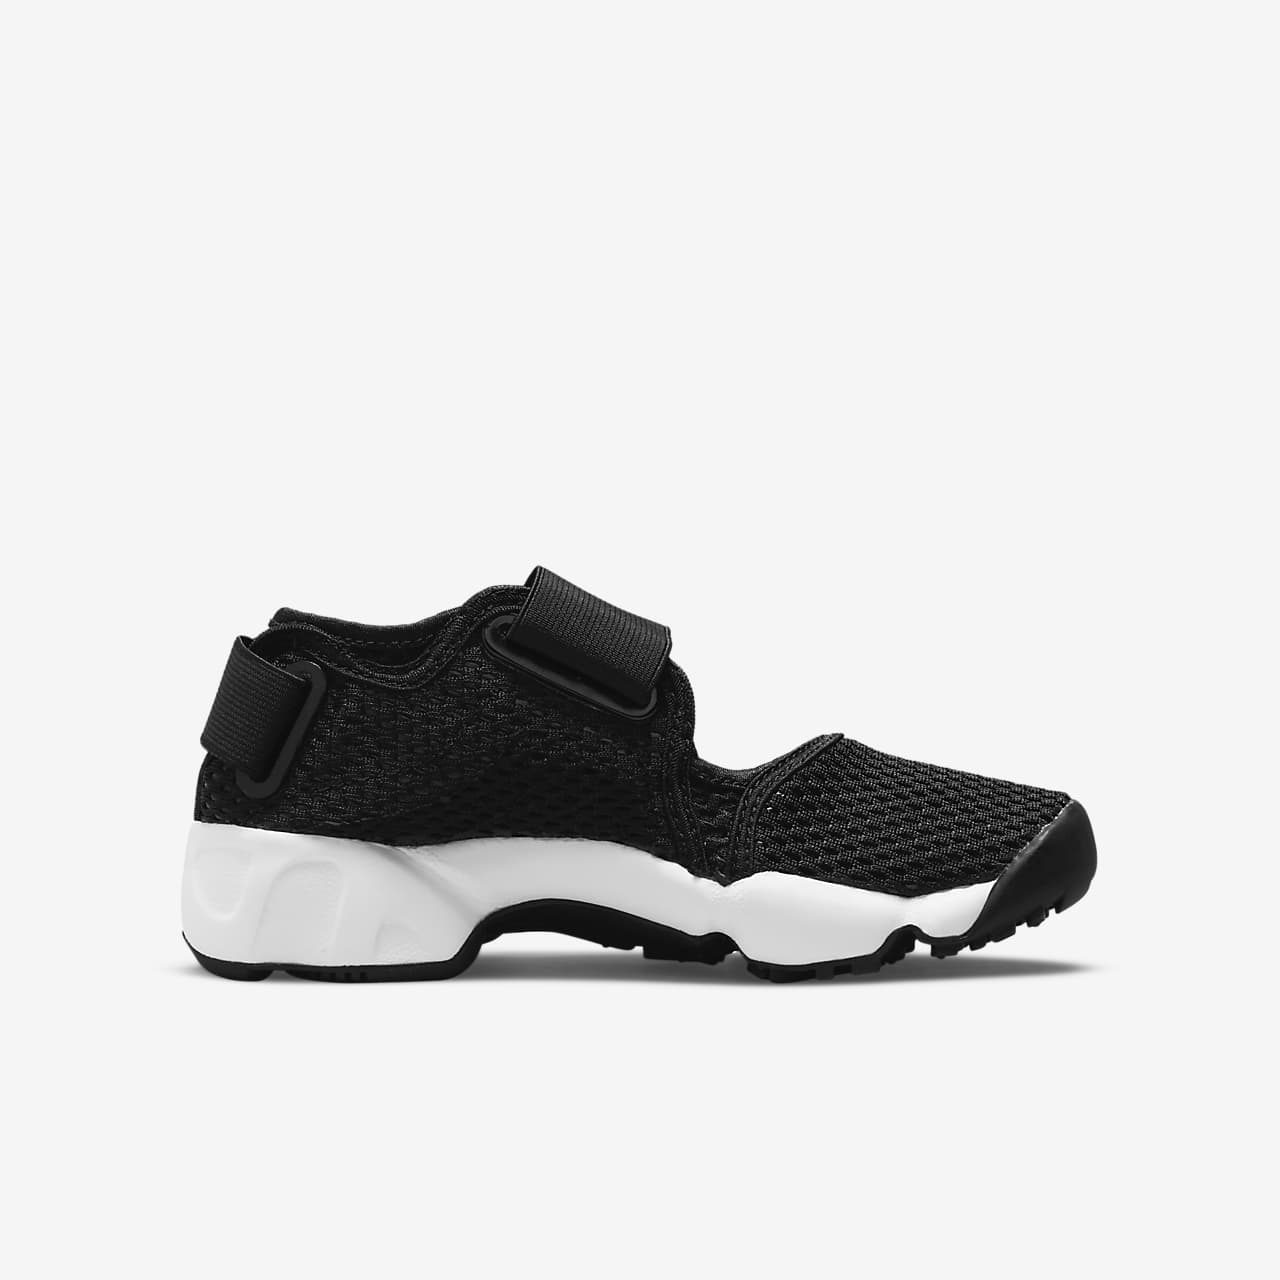 ... Nike Air Rift (10.5c-3y) Kids' Shoe